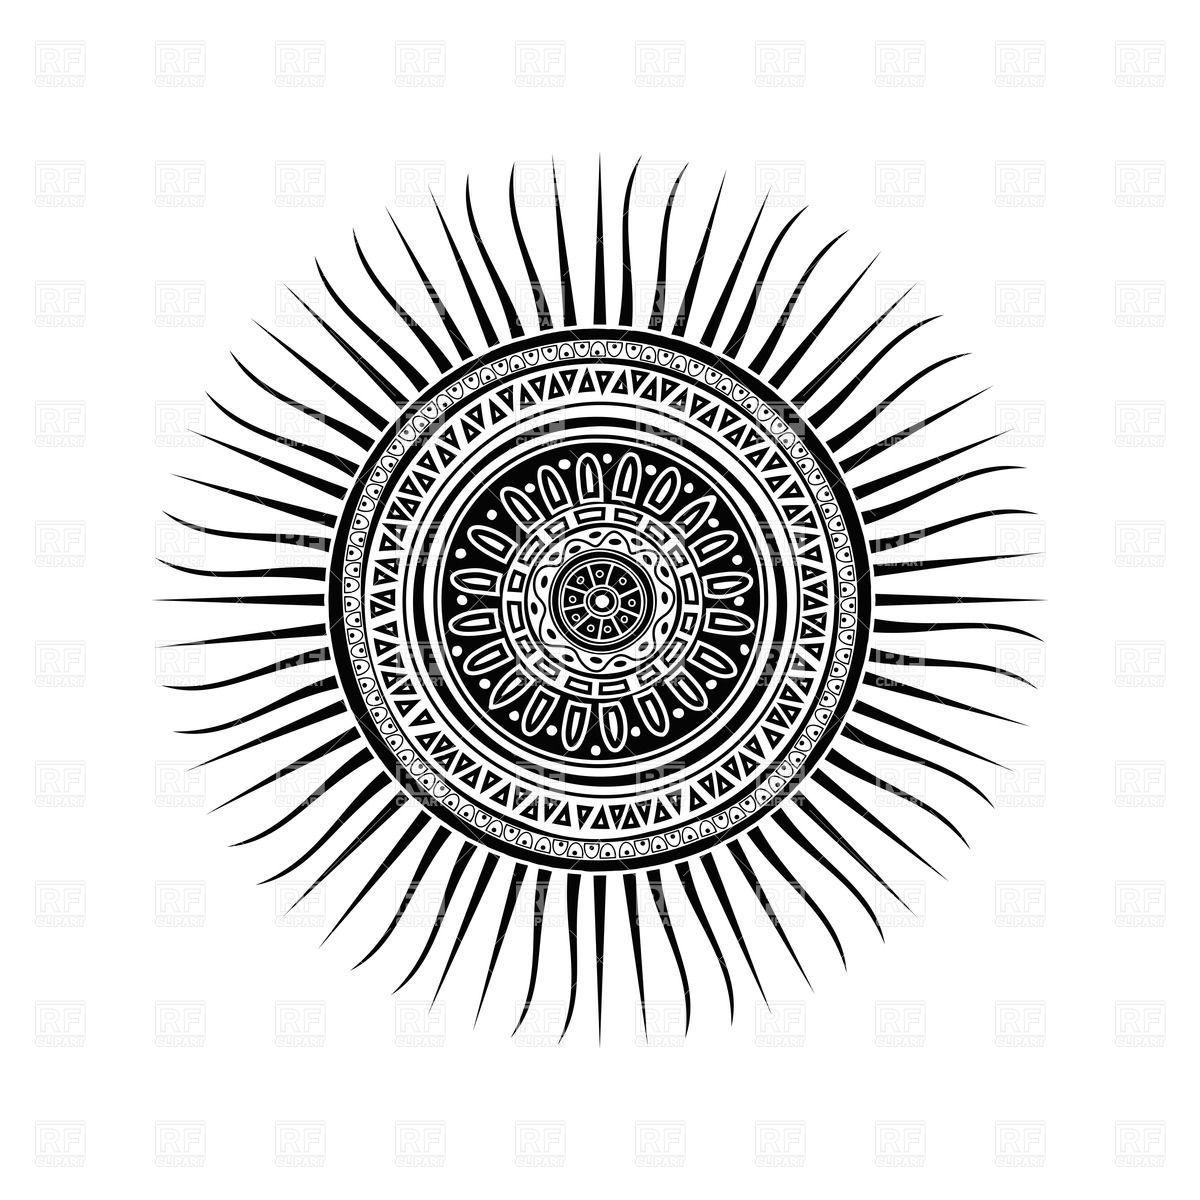 Mayan Sun Symbol Round Tattoo Ornament Vector Image